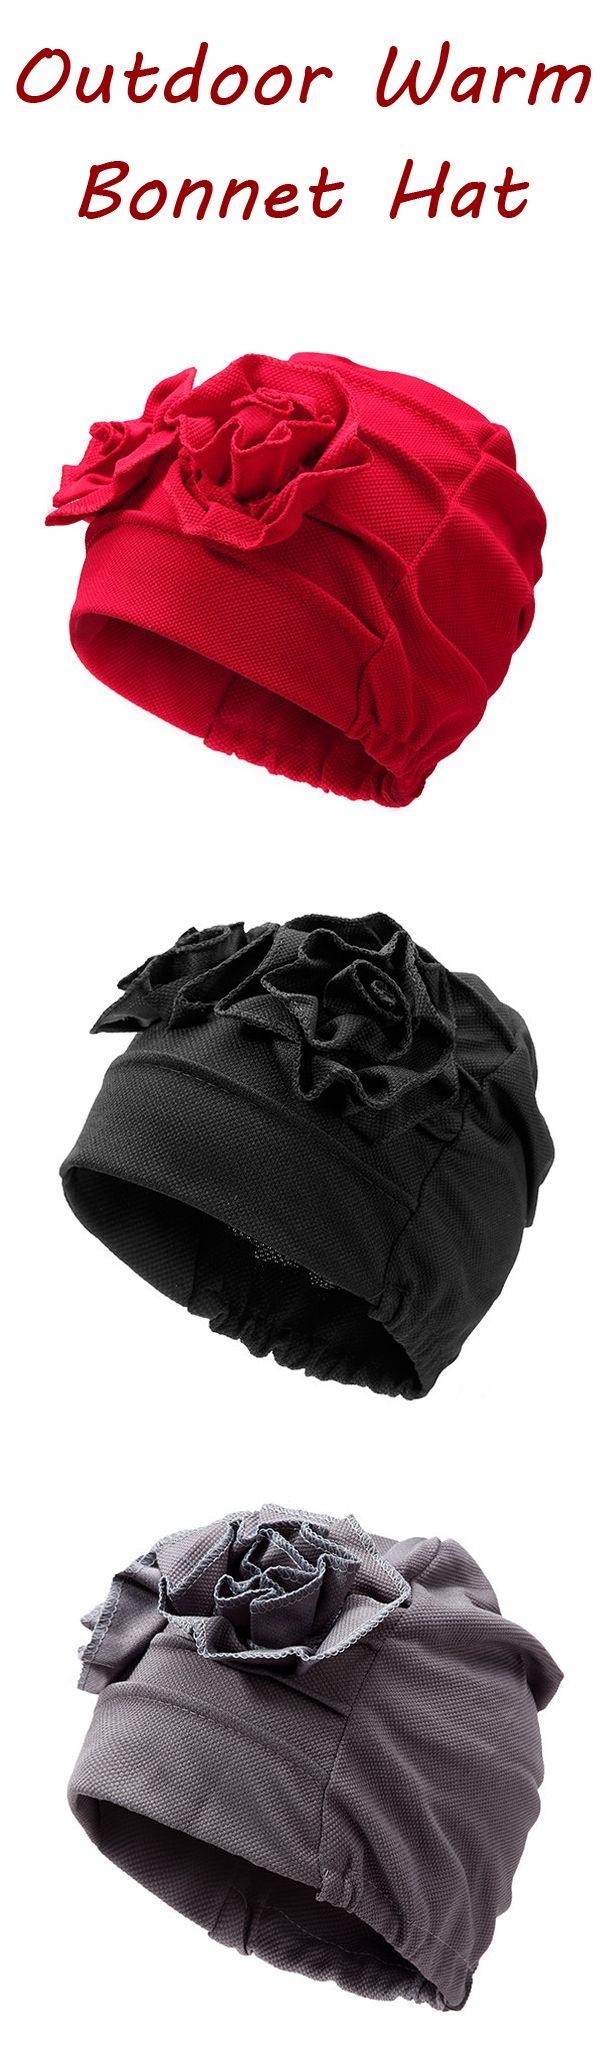 Women Side Plate Flower Cotton Beanies Cap Outdoor Warm Bonnet Hat